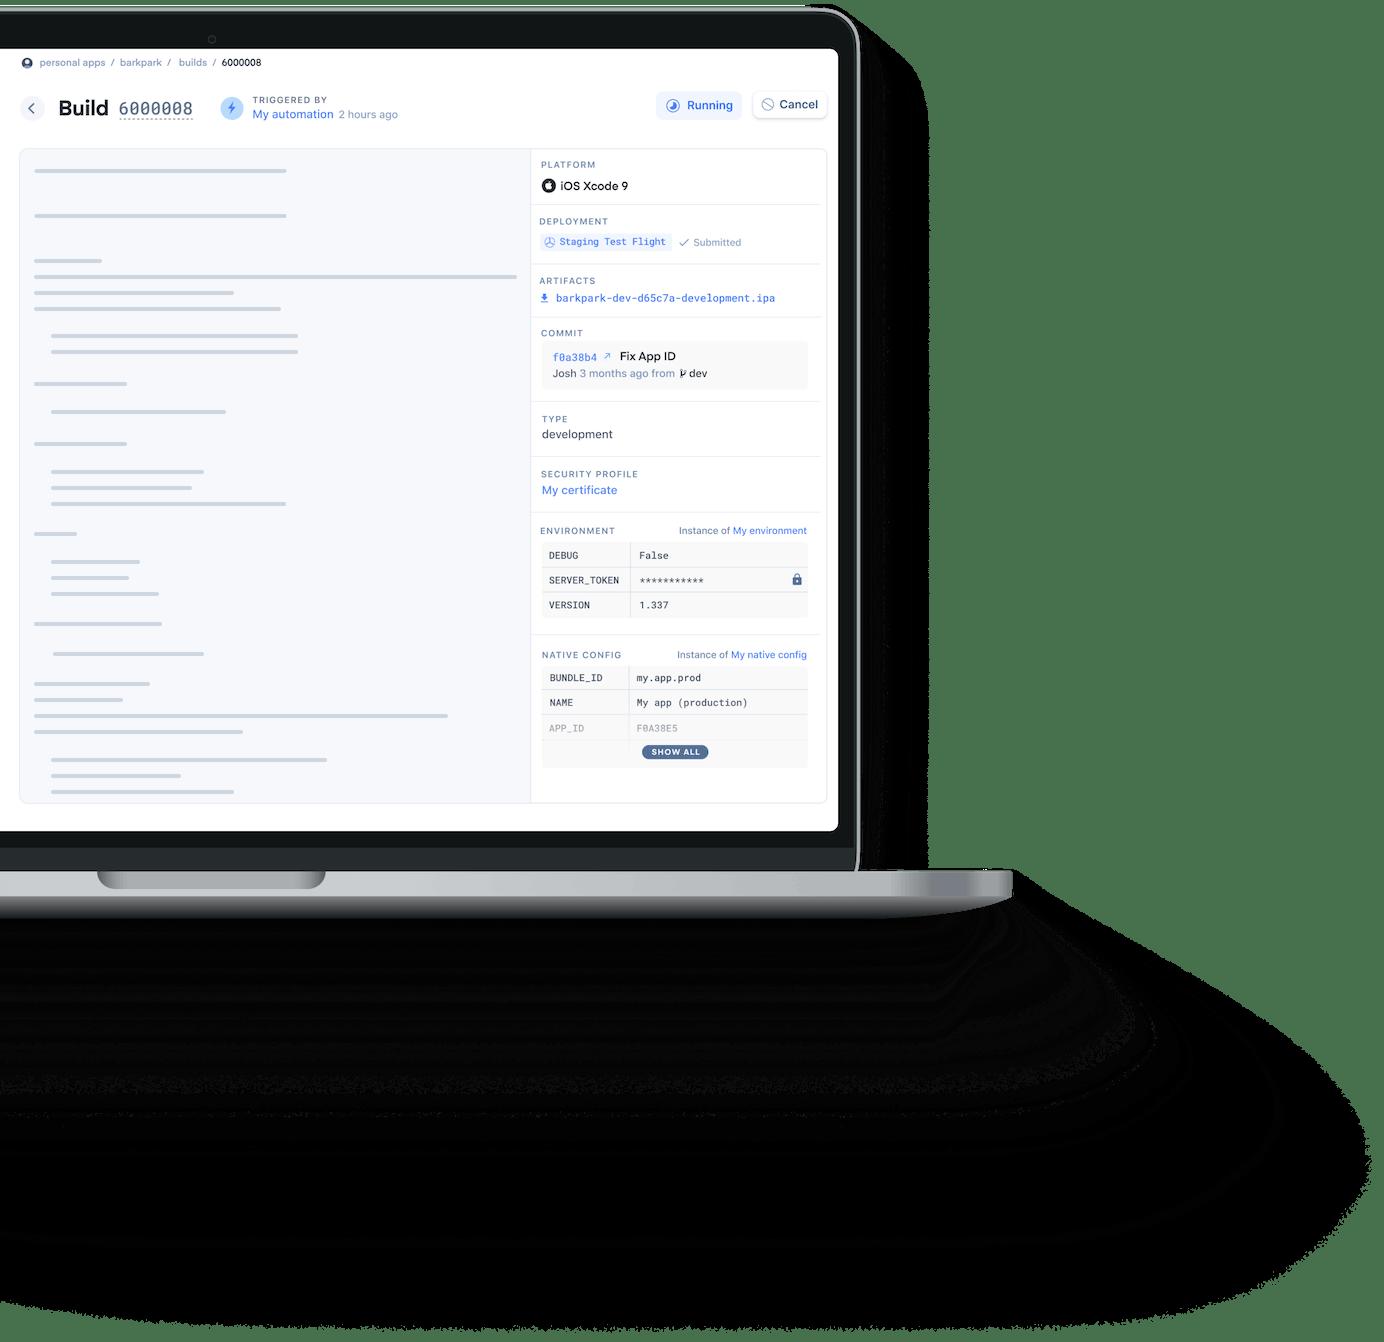 macbook with appflow dashboard